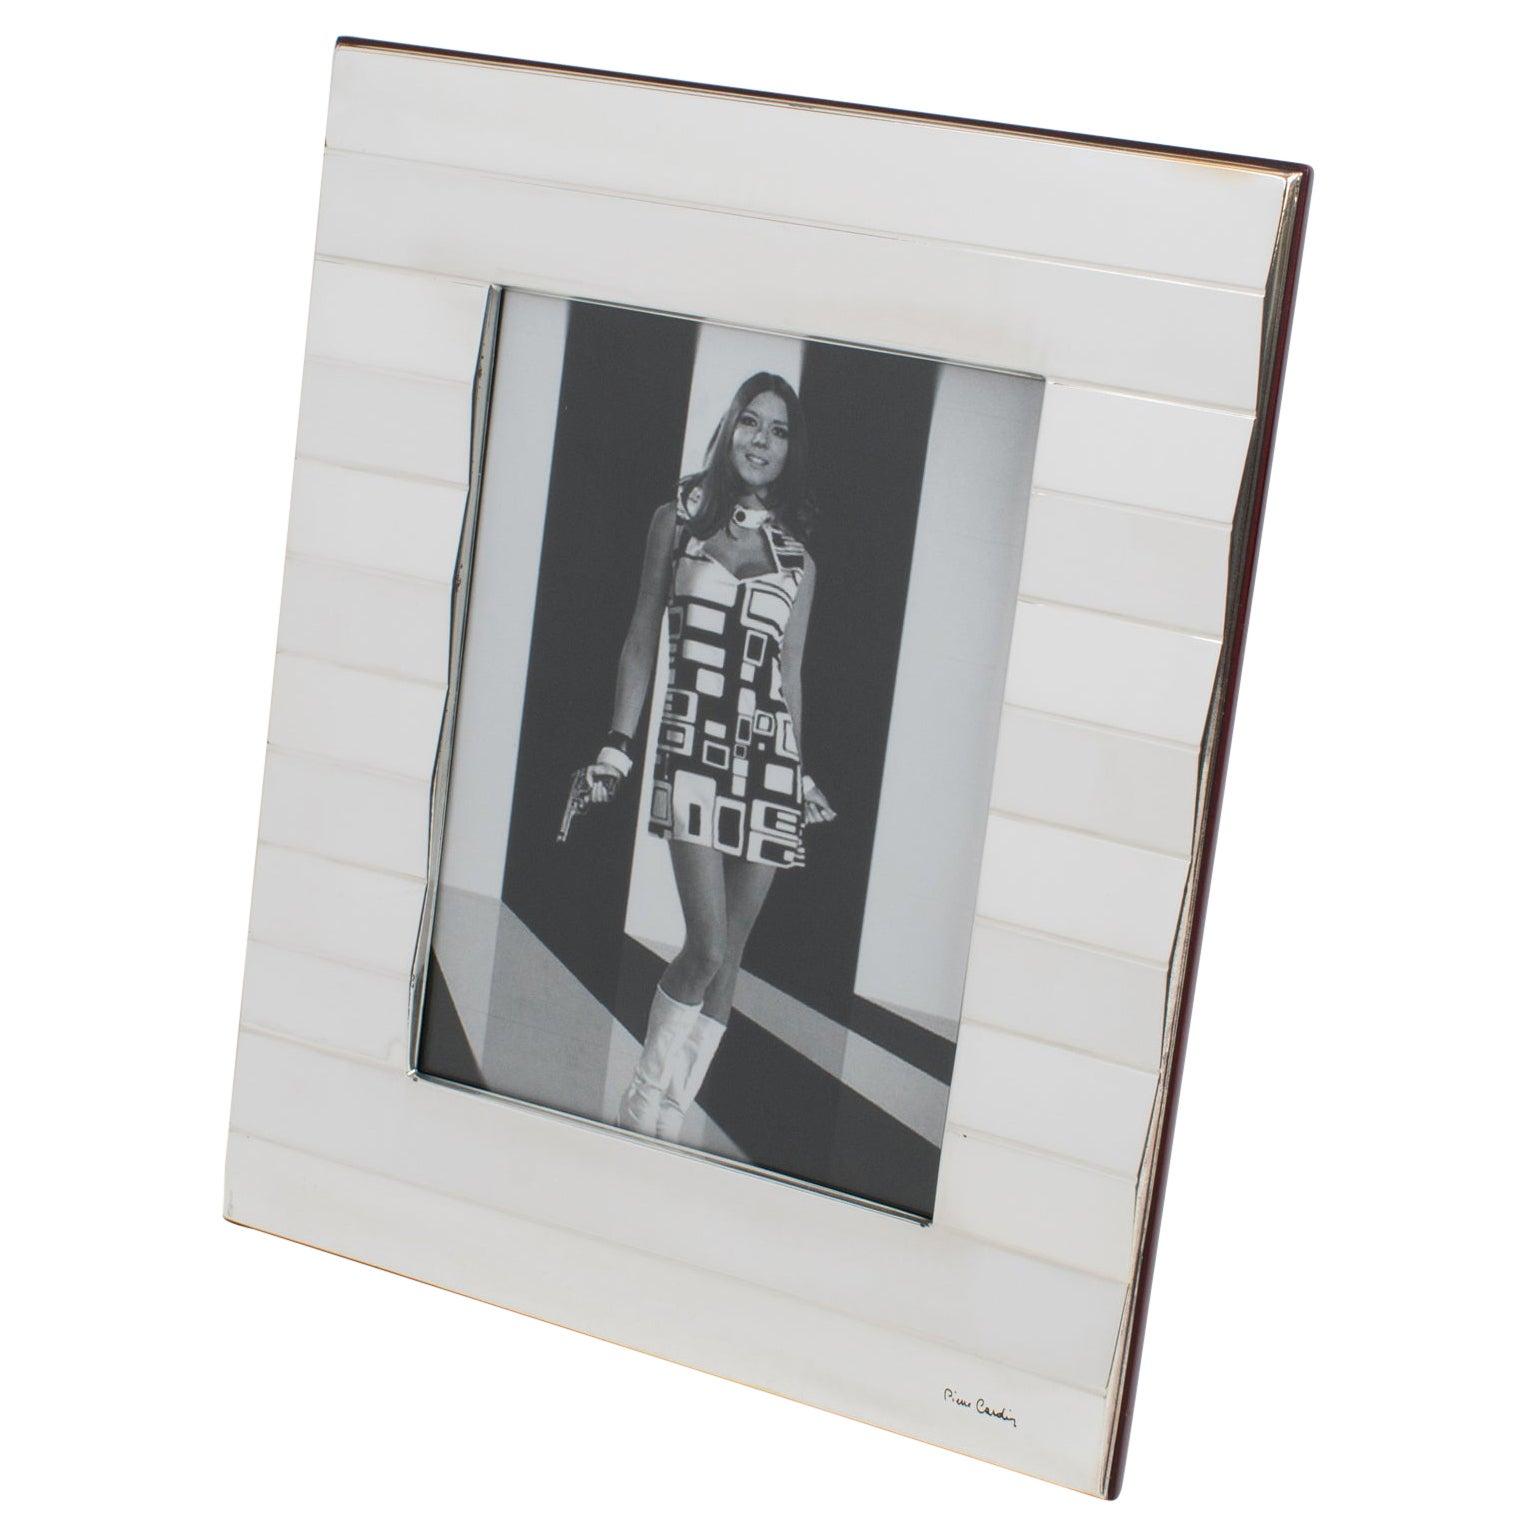 Pierre Cardin Paris Silver Plate Picture Frame